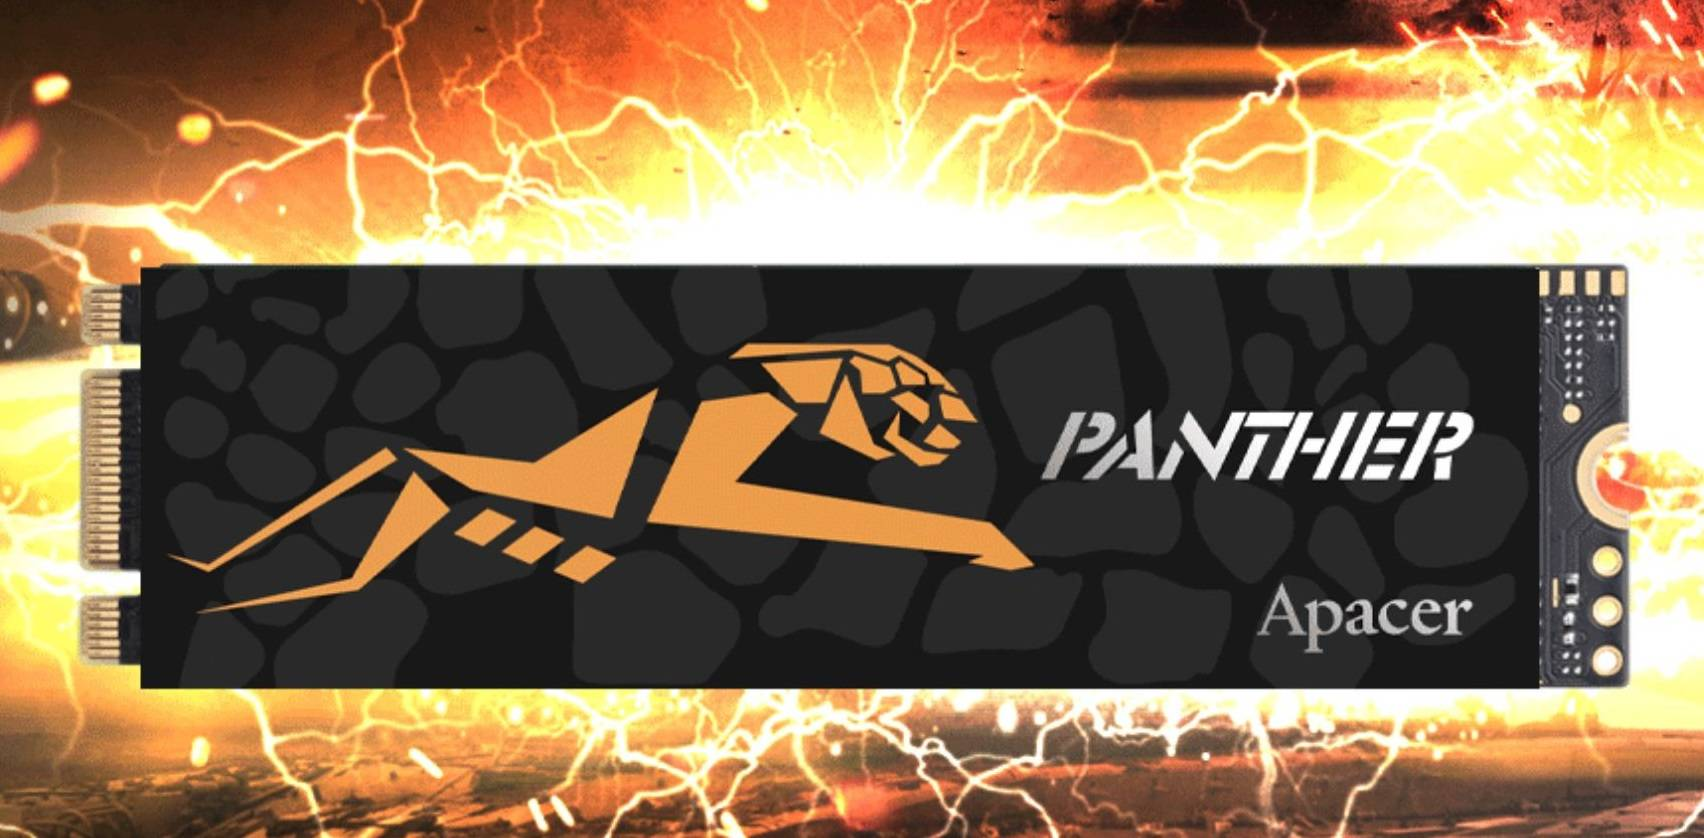 Apacer از اس اس دی جدید Panther AS2280P2 PRO رونمایی کرد